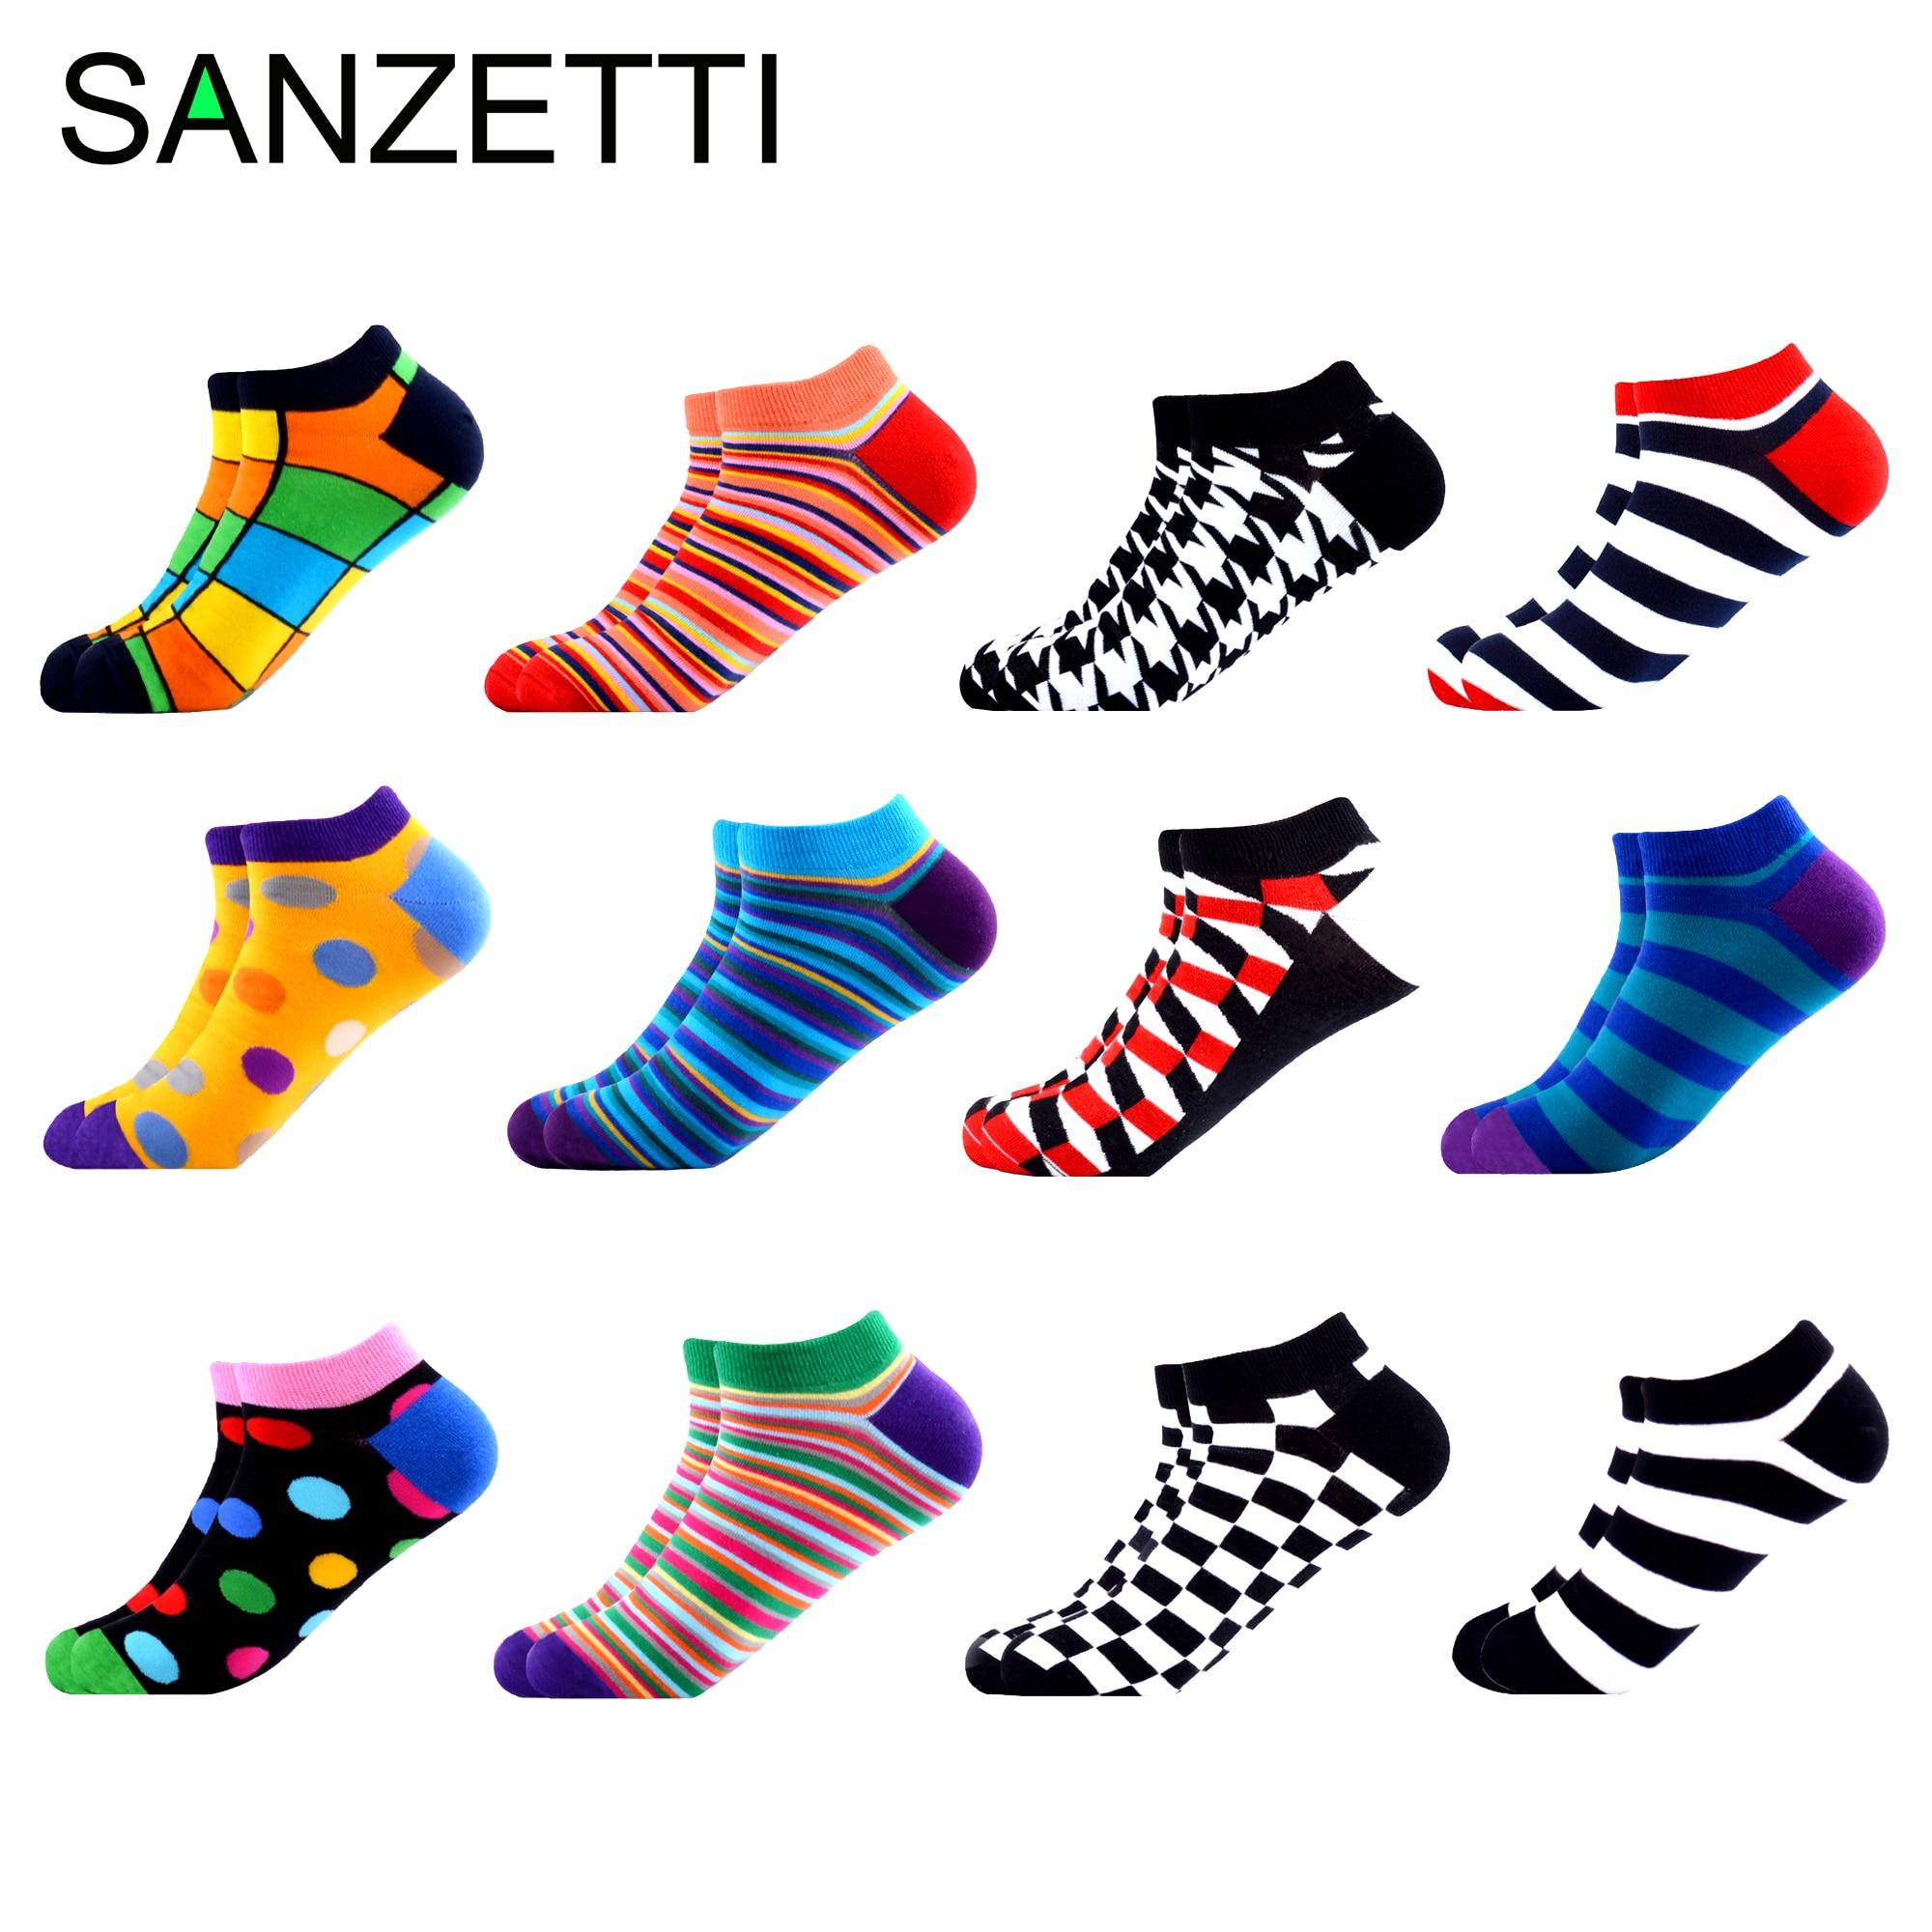 Anzetti 6 Pairs/lot Men Women Casual Ankle Socks Combed Cotton Socks Black White Red Plaid Stripes Geometric Pattern Boat Socks Men's Socks